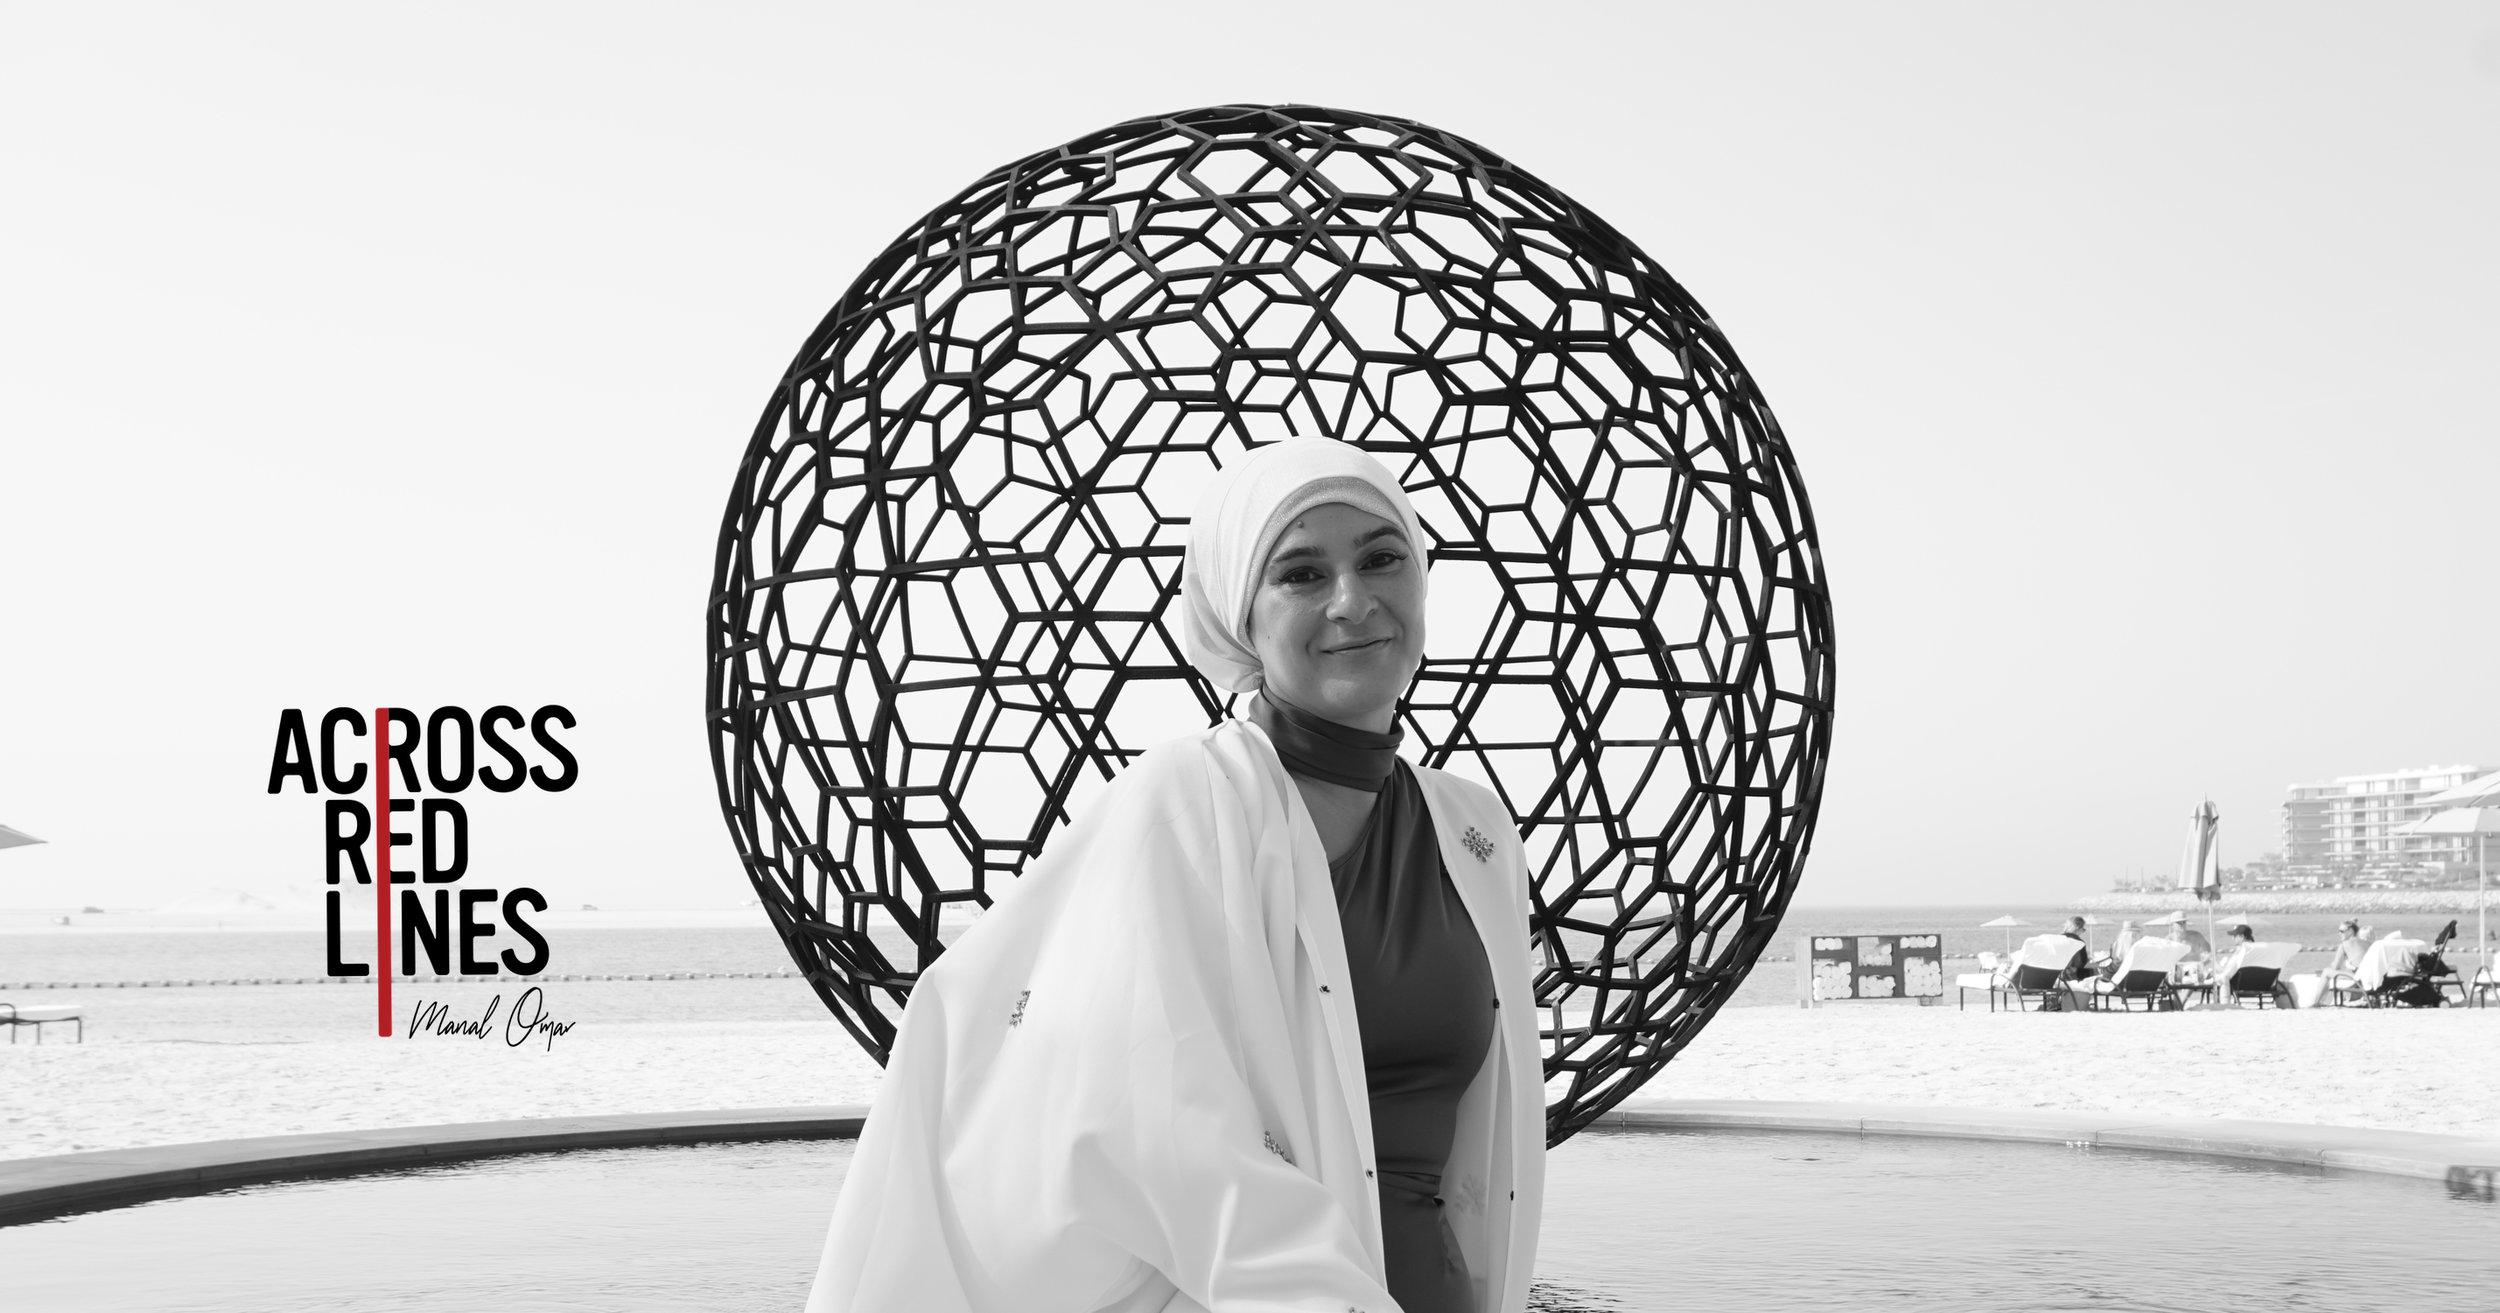 Manal Omar, Founder, Teacher, Women's Rights Advocate